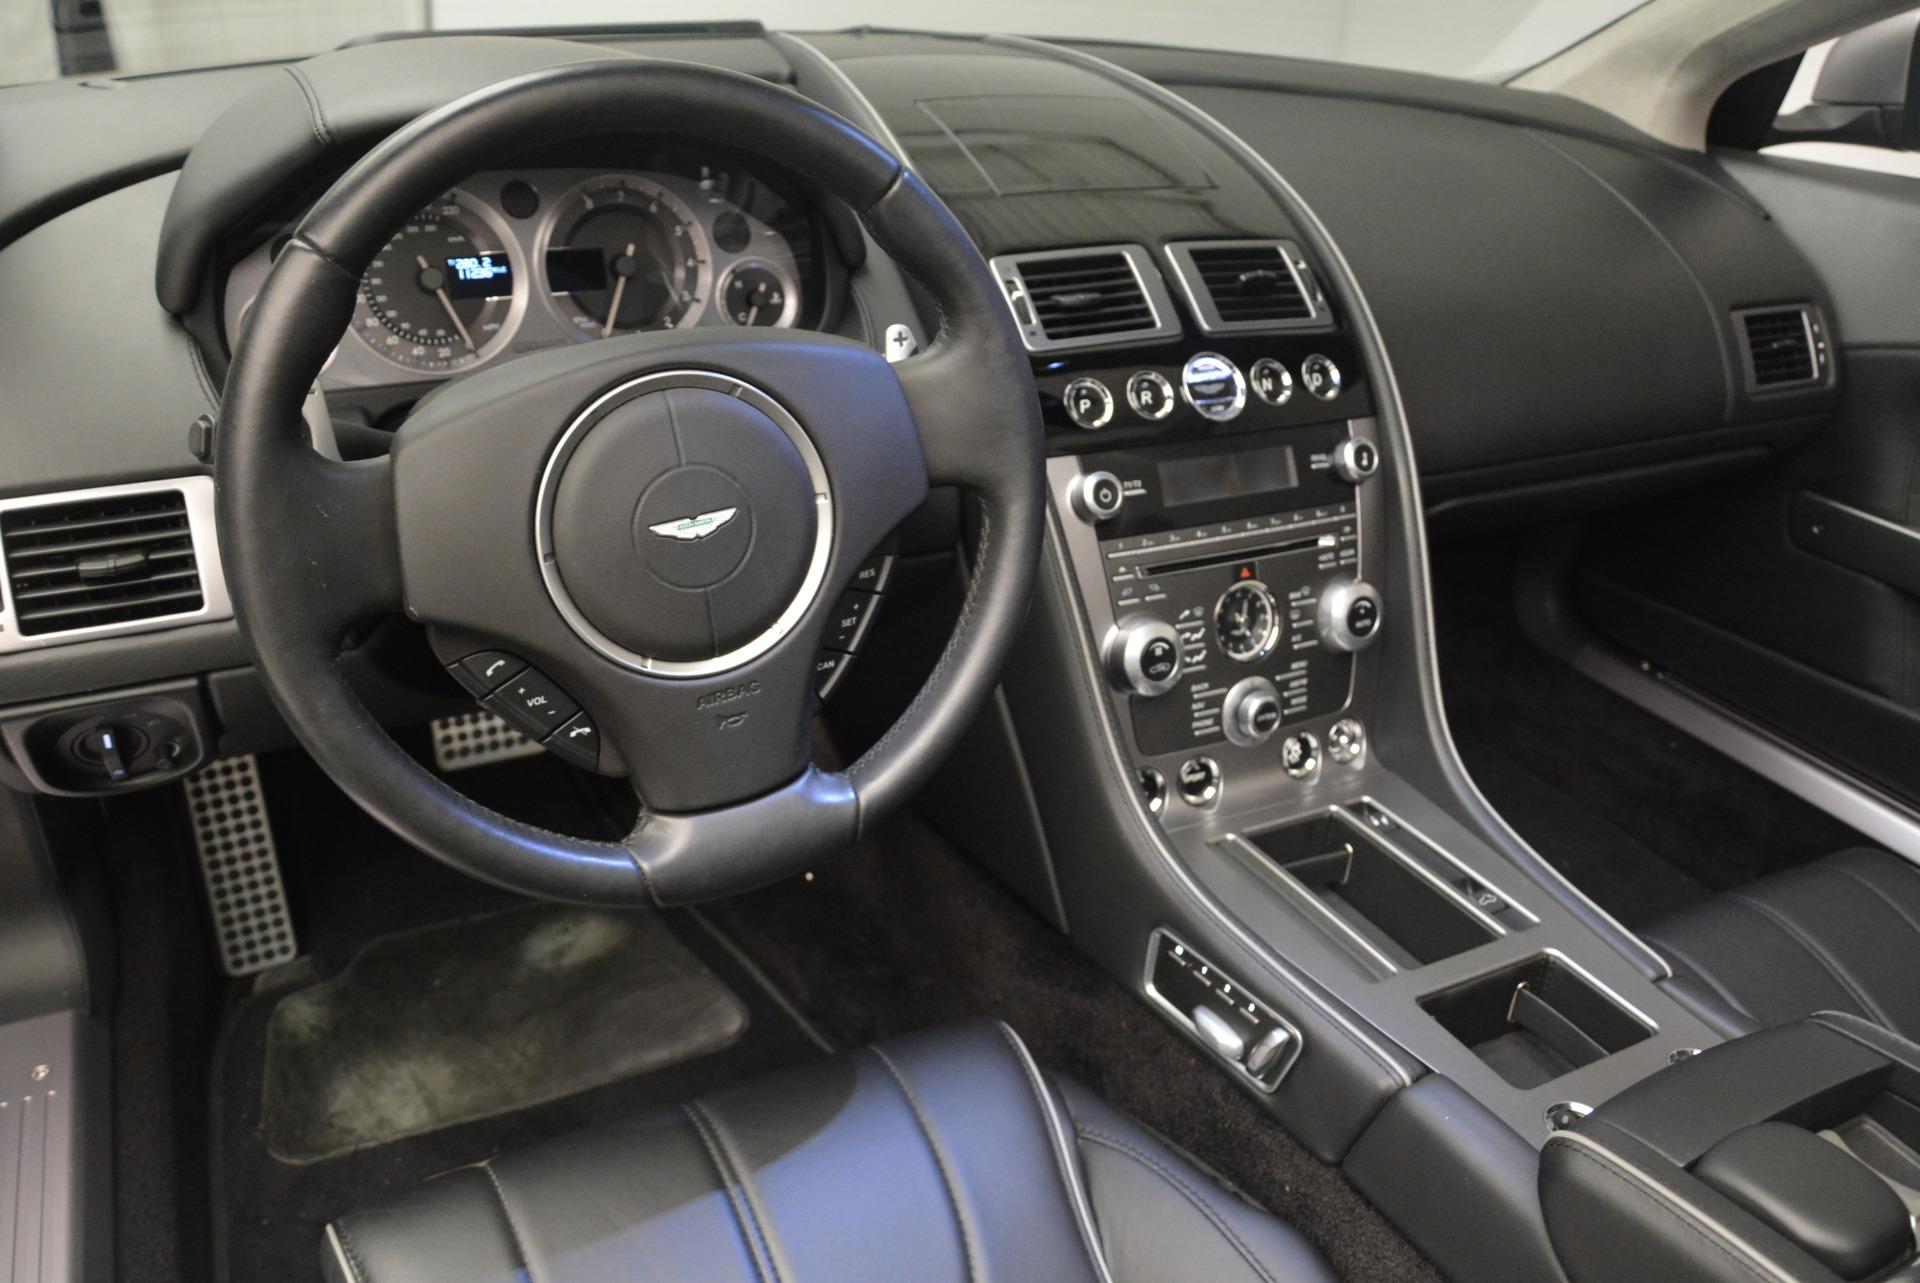 Used 2012 Aston Martin Virage Volante For Sale In Westport, CT 2378_p26